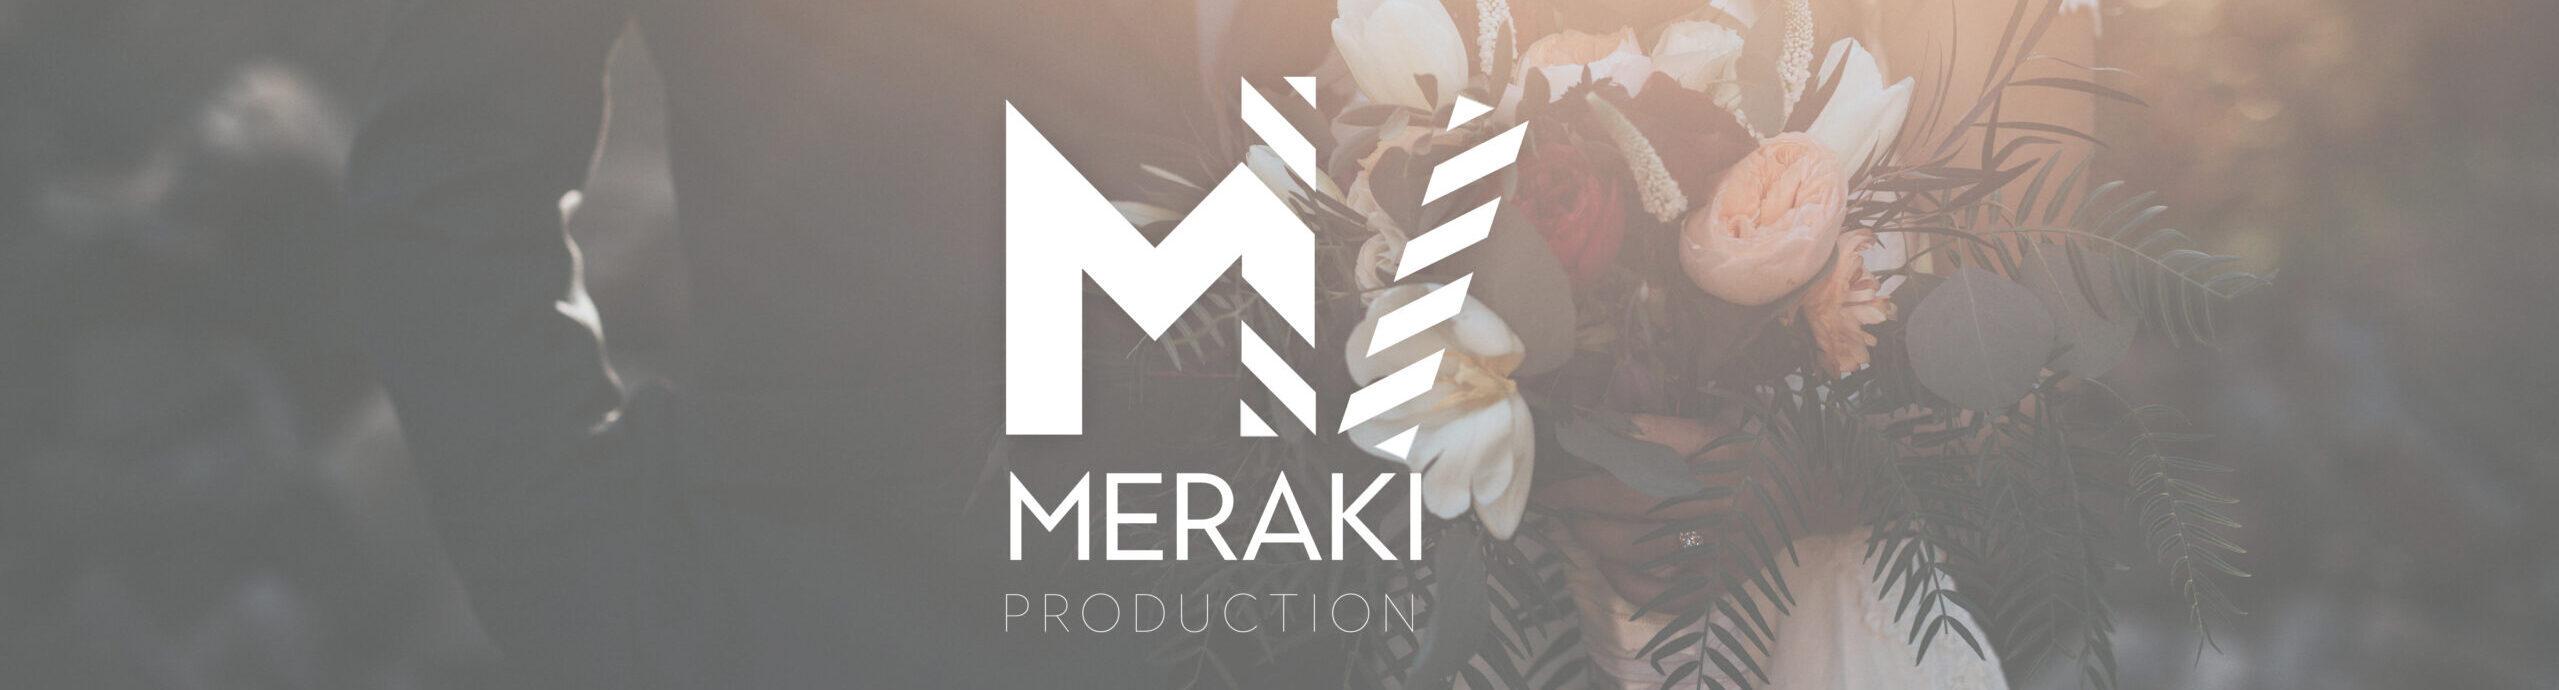 Logo for Meraki production